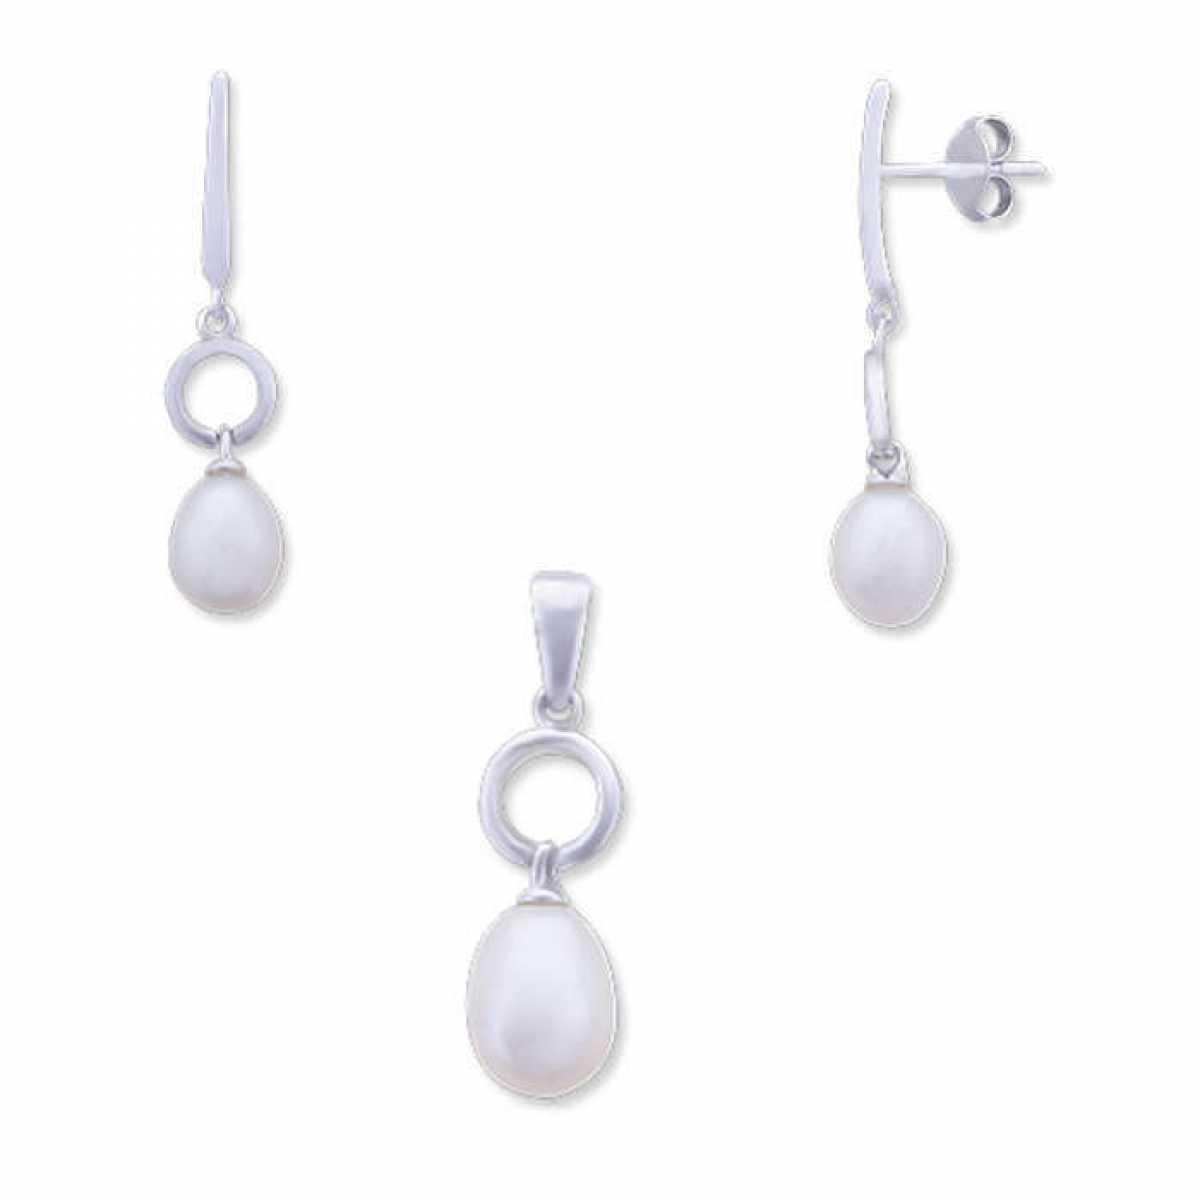 Hanging Pearl Pendant Set